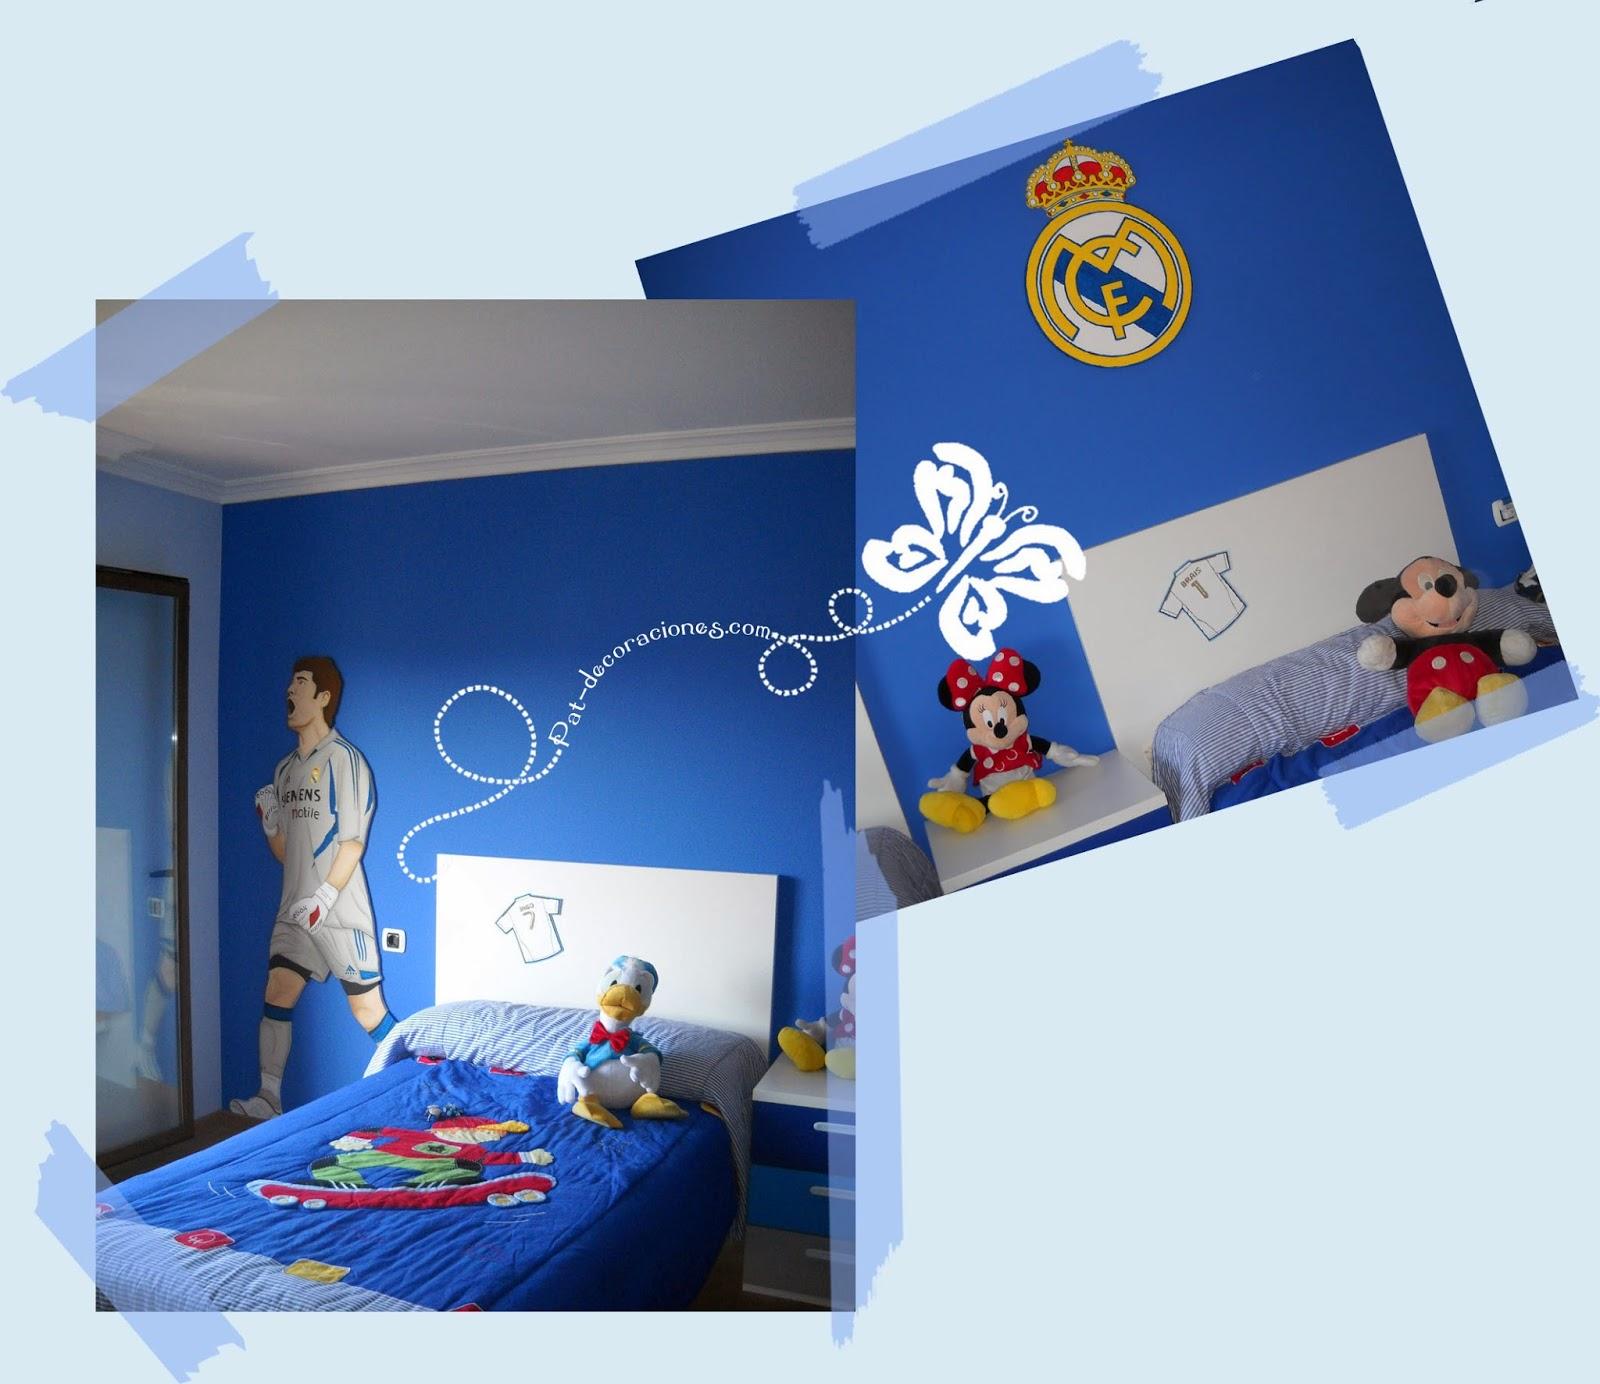 Pat decoraciones habitaci n del real madrid for Habitacion cuadruple madrid